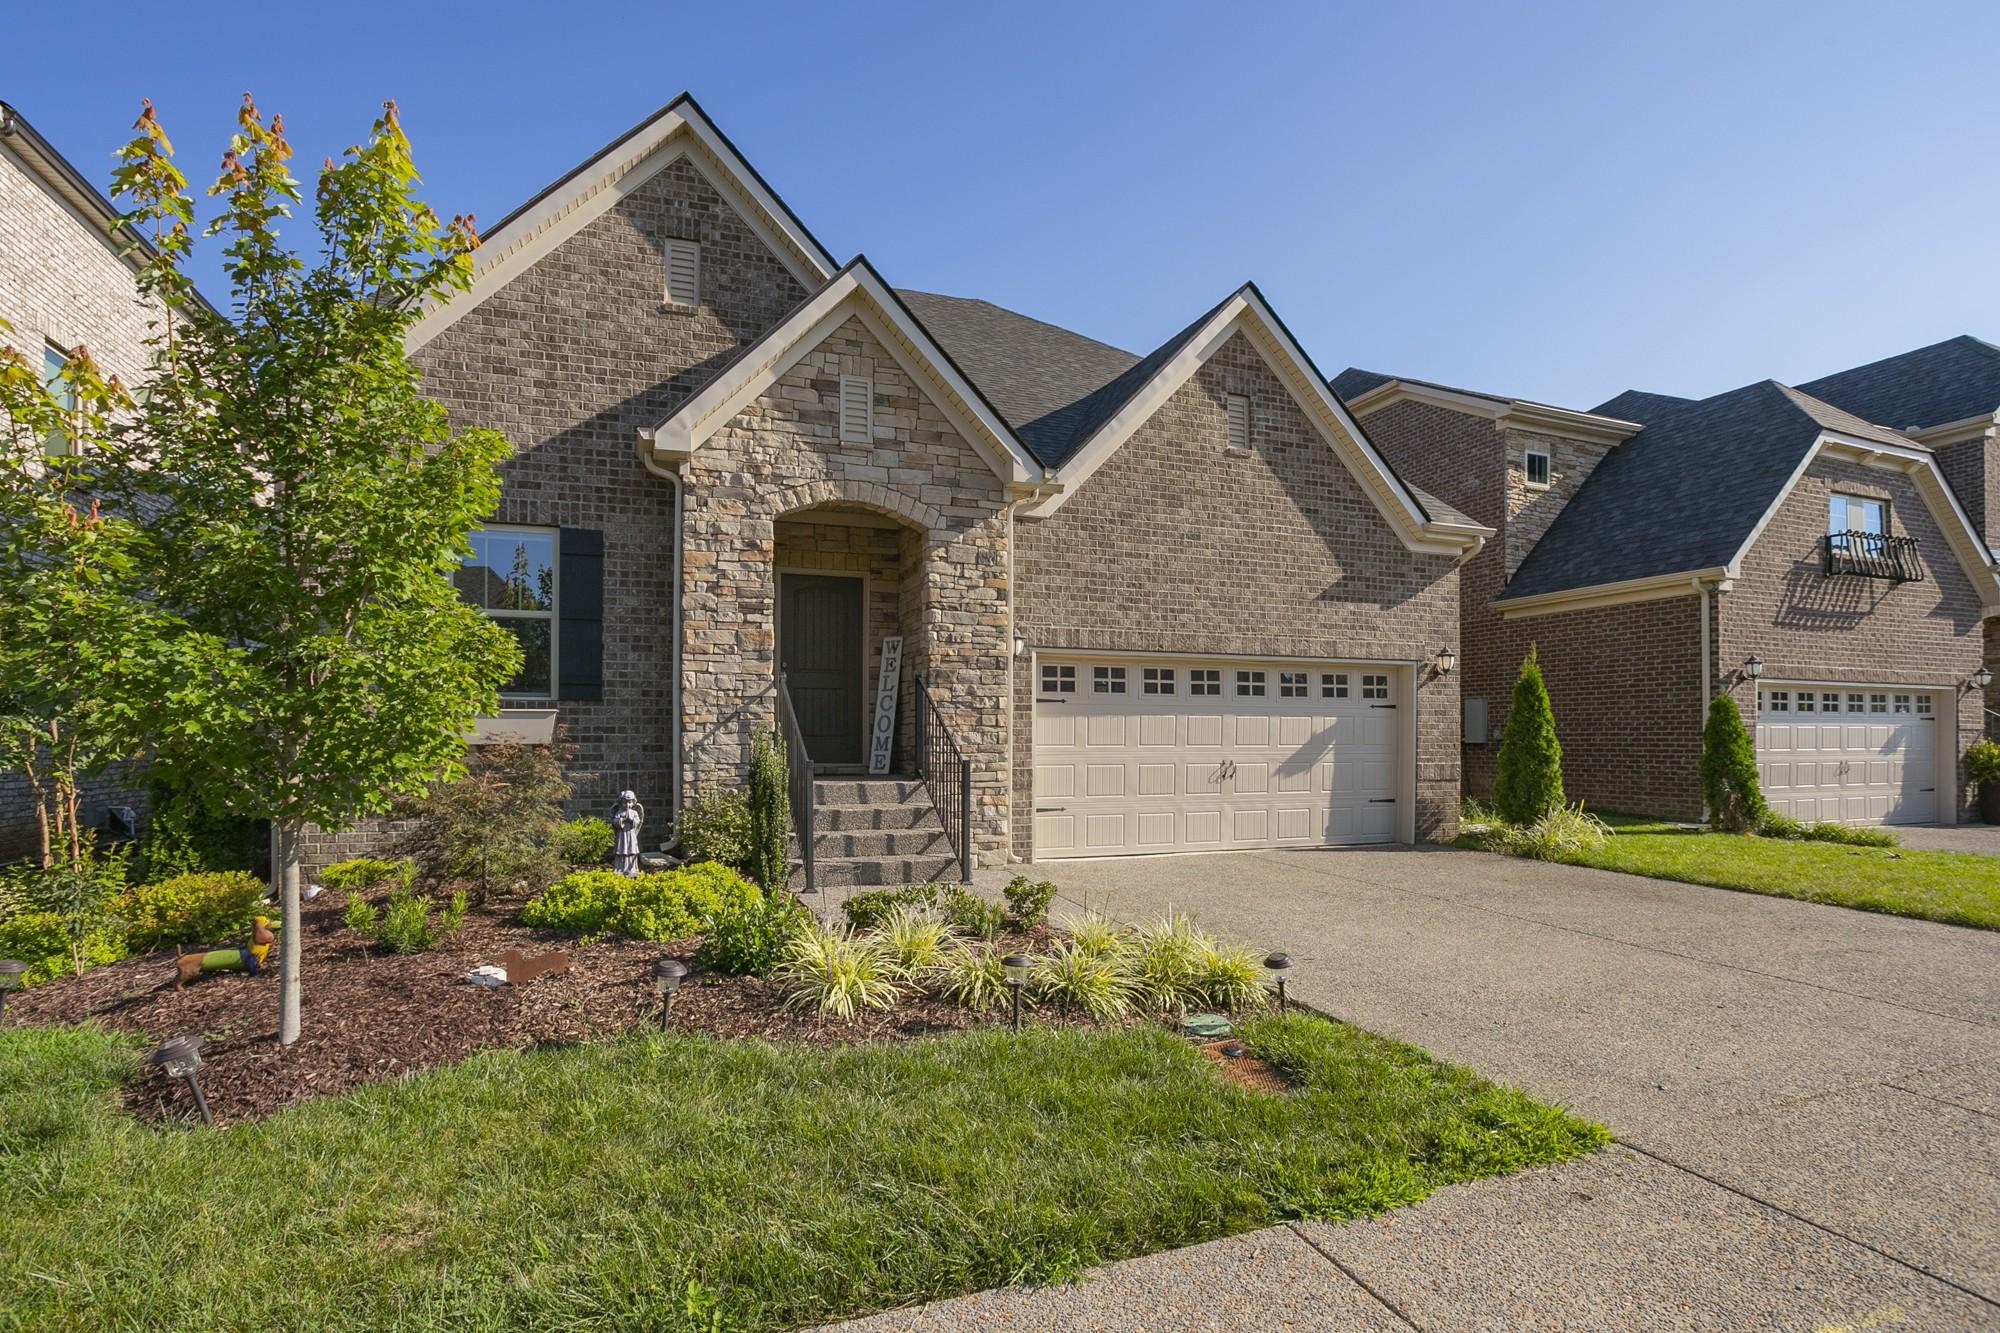 4263 Stone Hall Blvd Property Photo - Hermitage, TN real estate listing